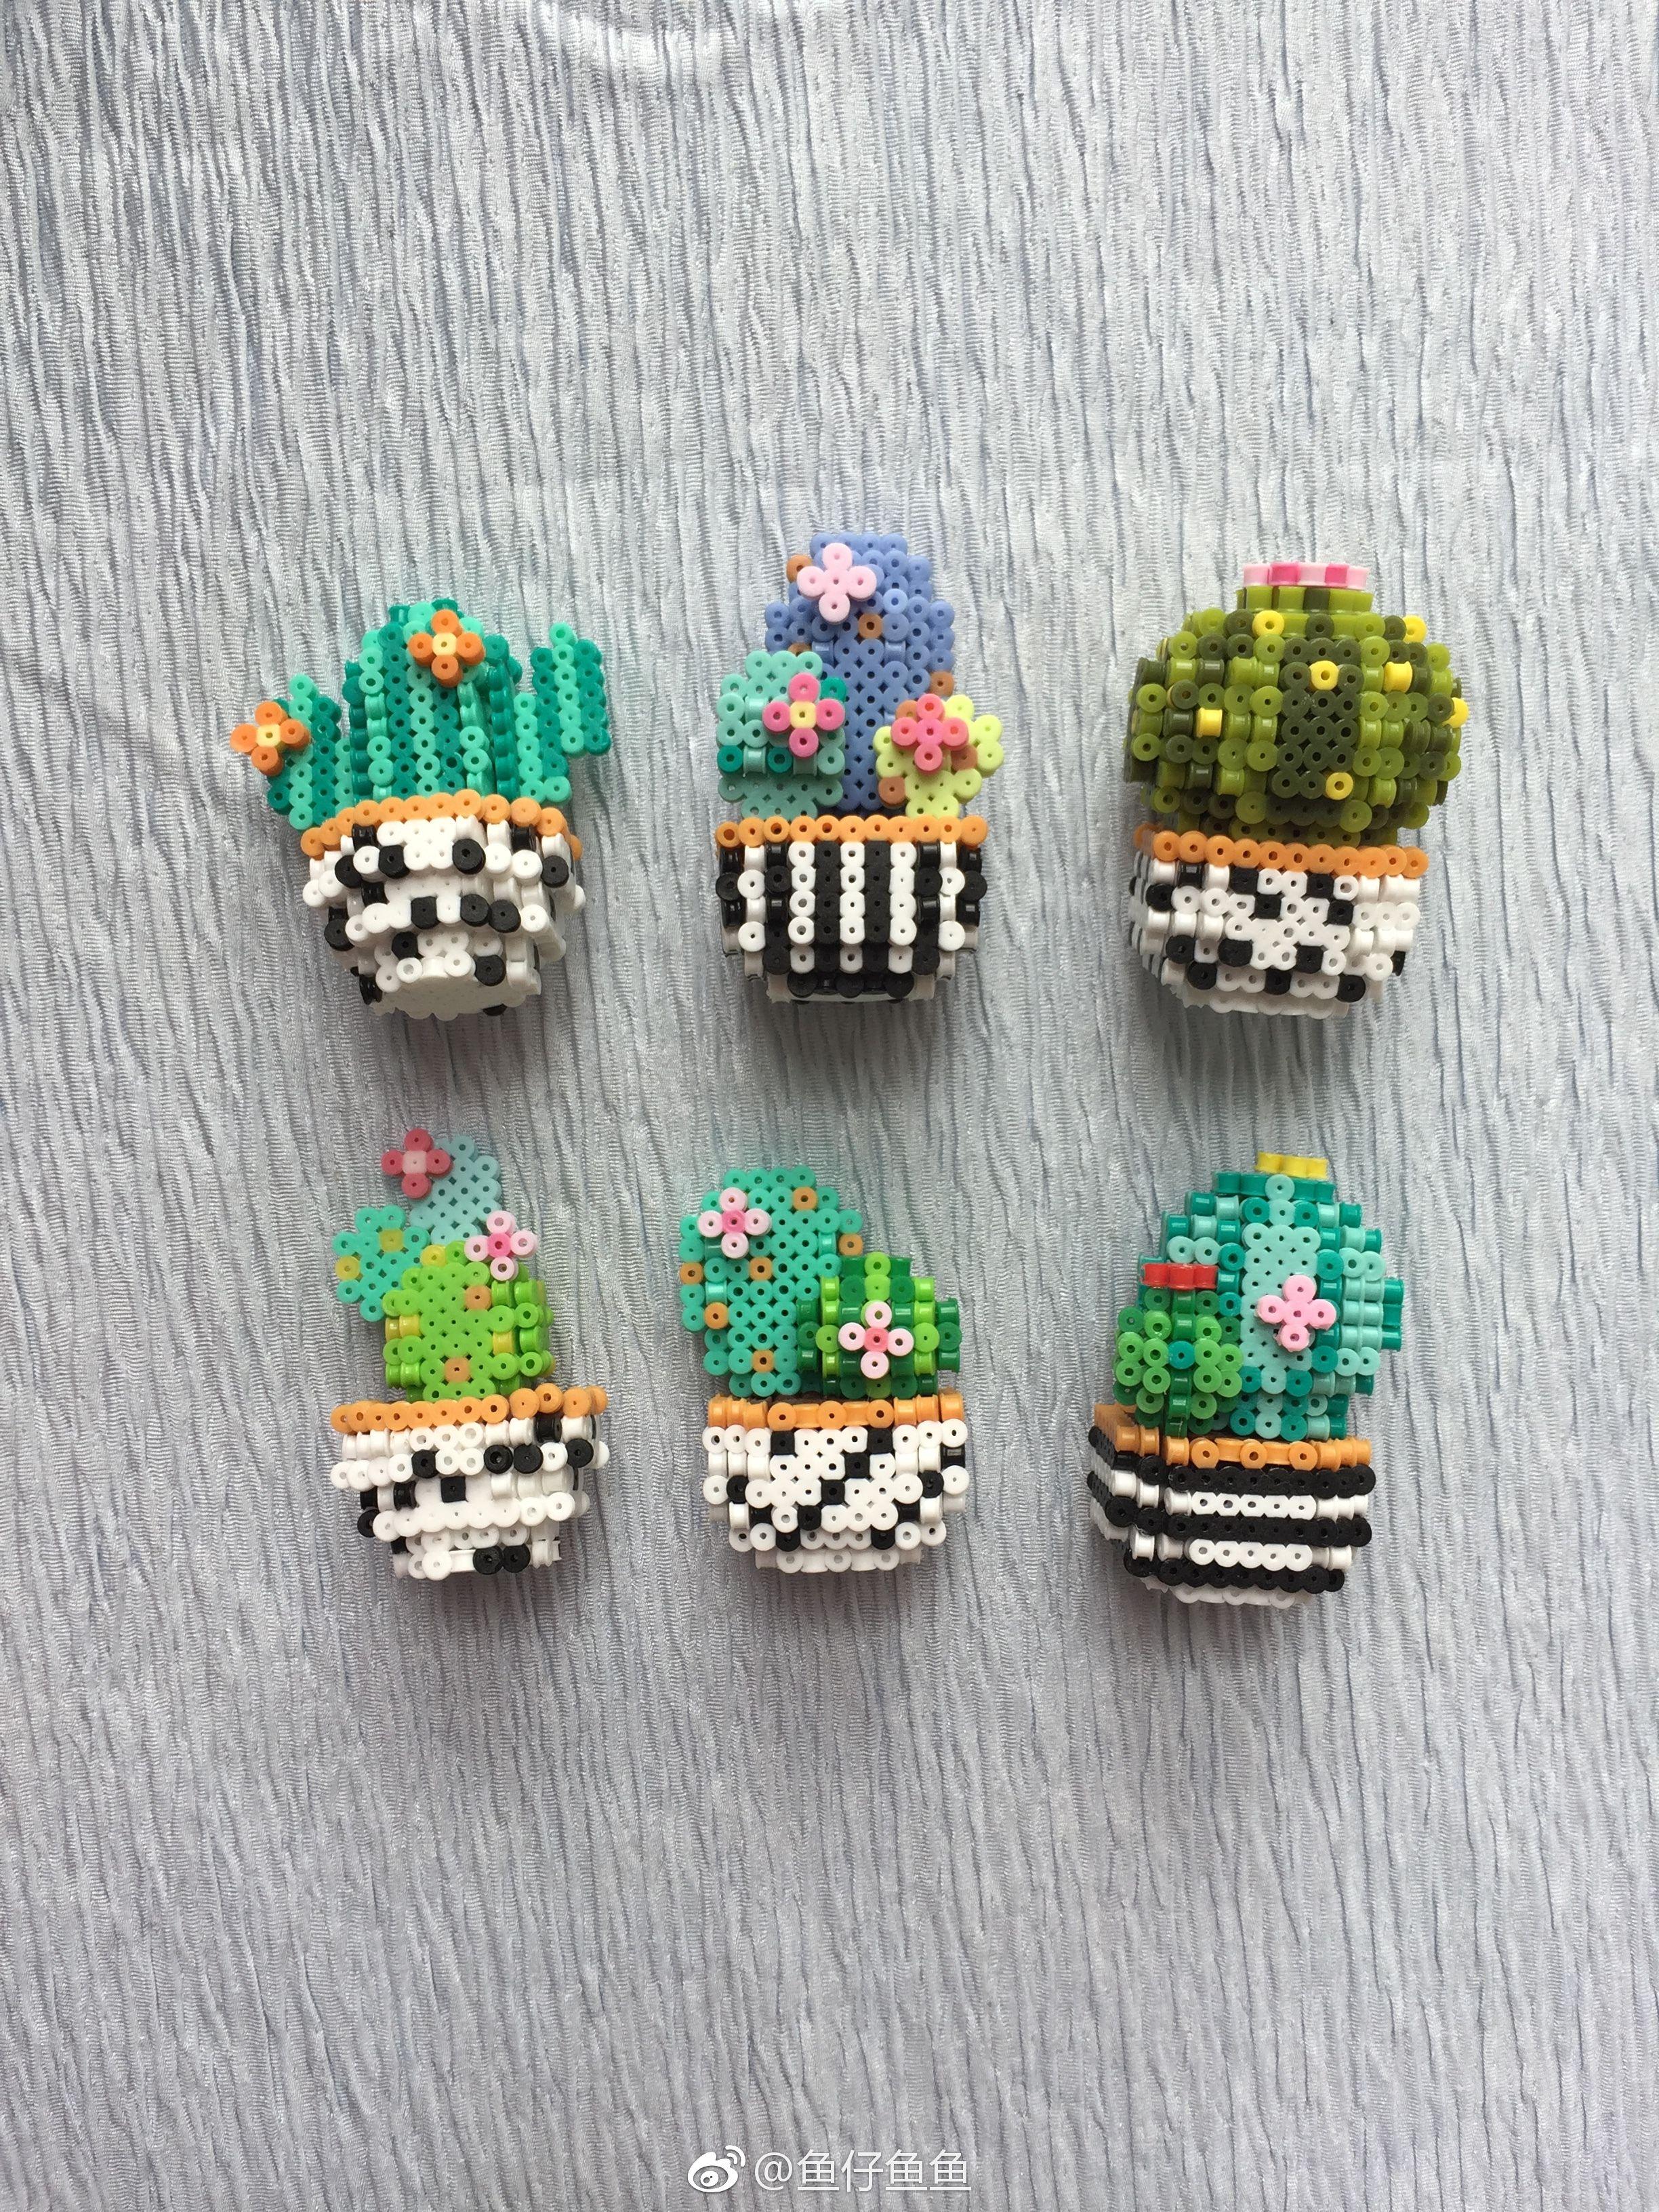 cactus 3d perler beads charts 8 bit pixel art square